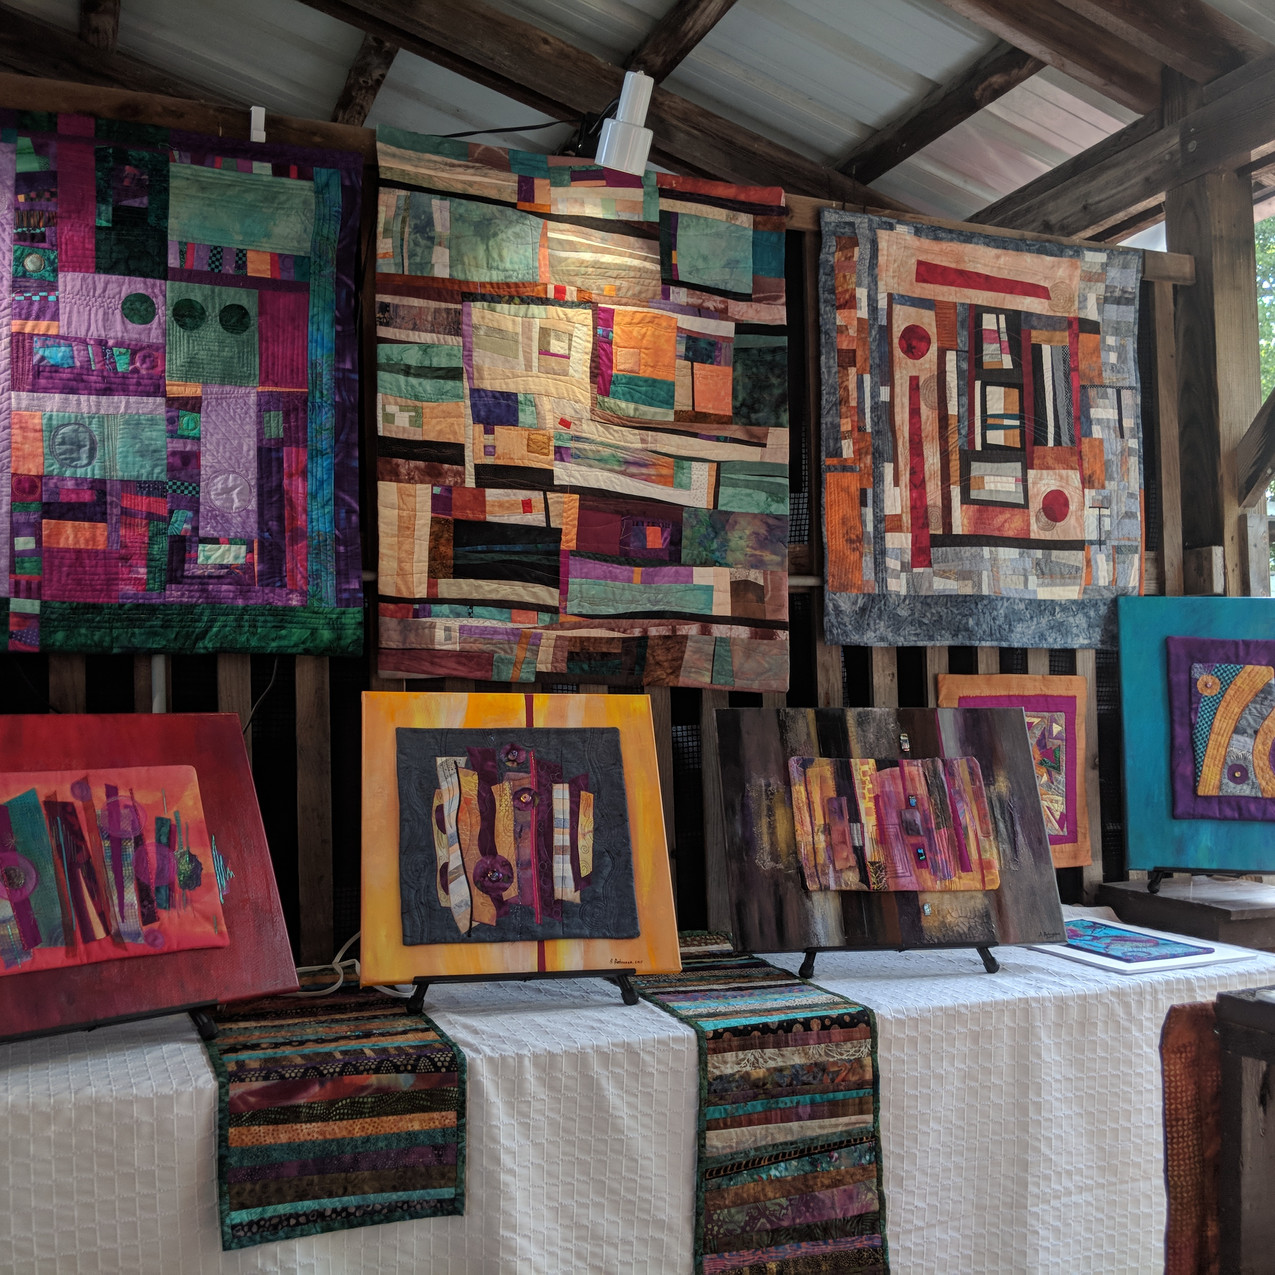 Exhibit at Ithaca Artists Market